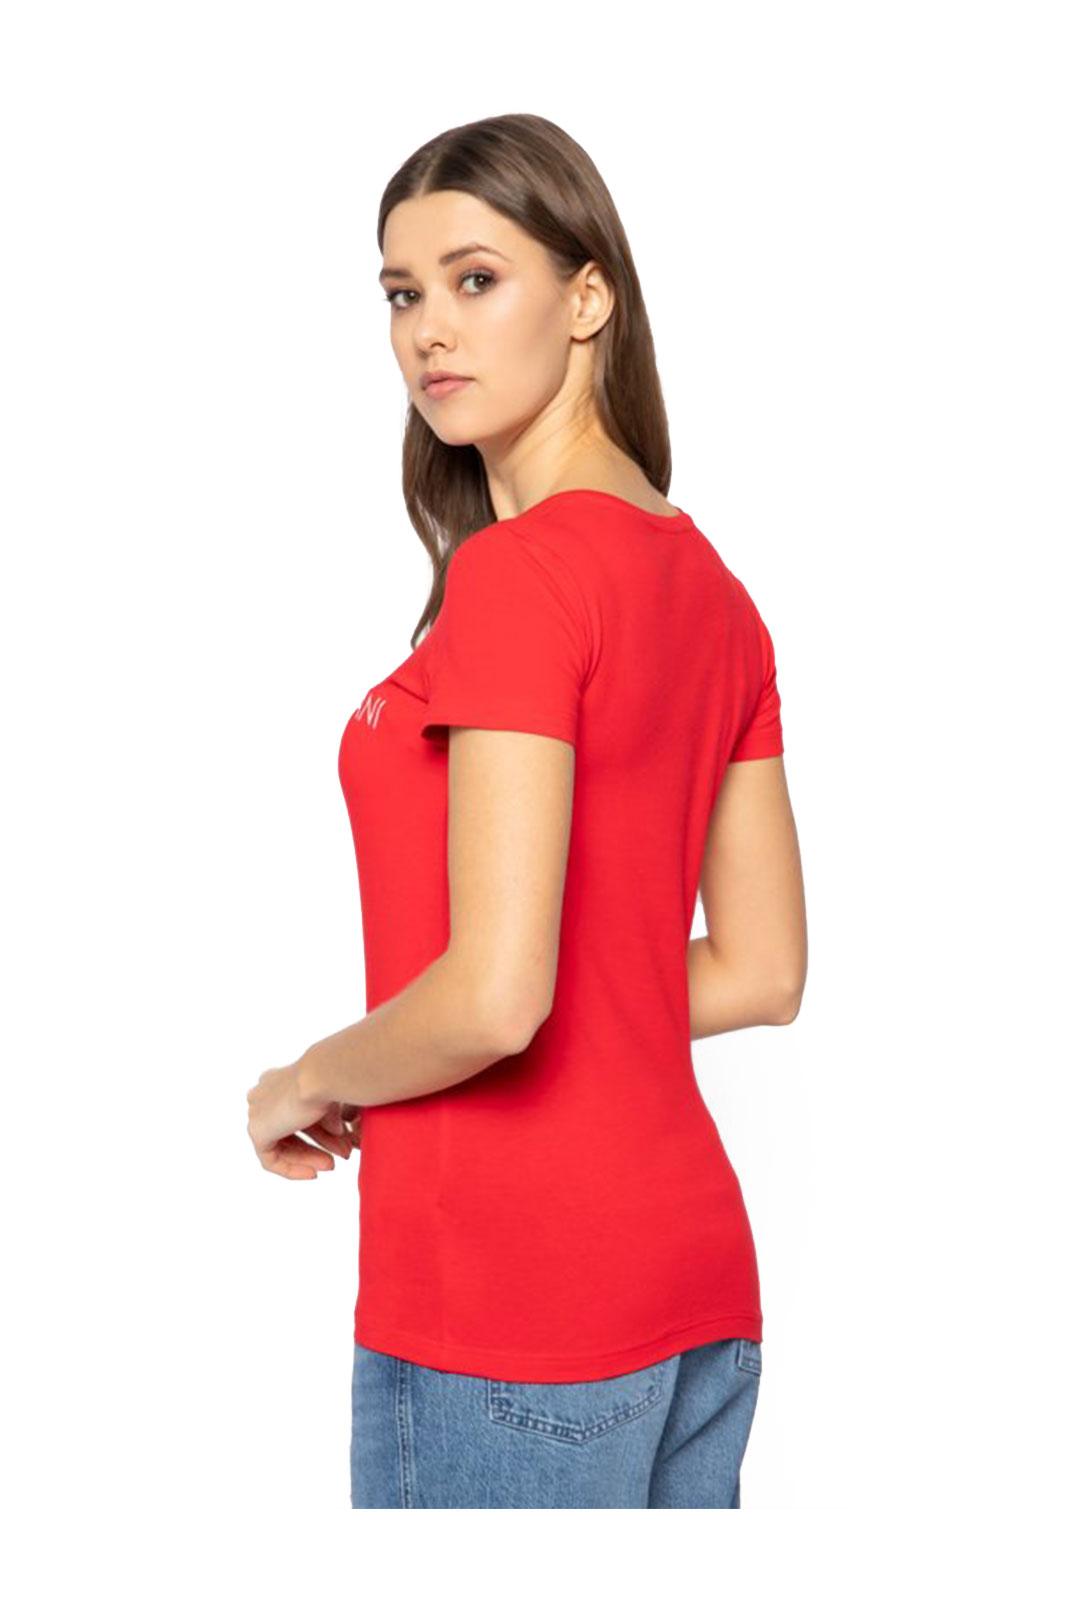 Tops & Tee shirts  Emporio armani 163321 0P317 00074 ROSSO